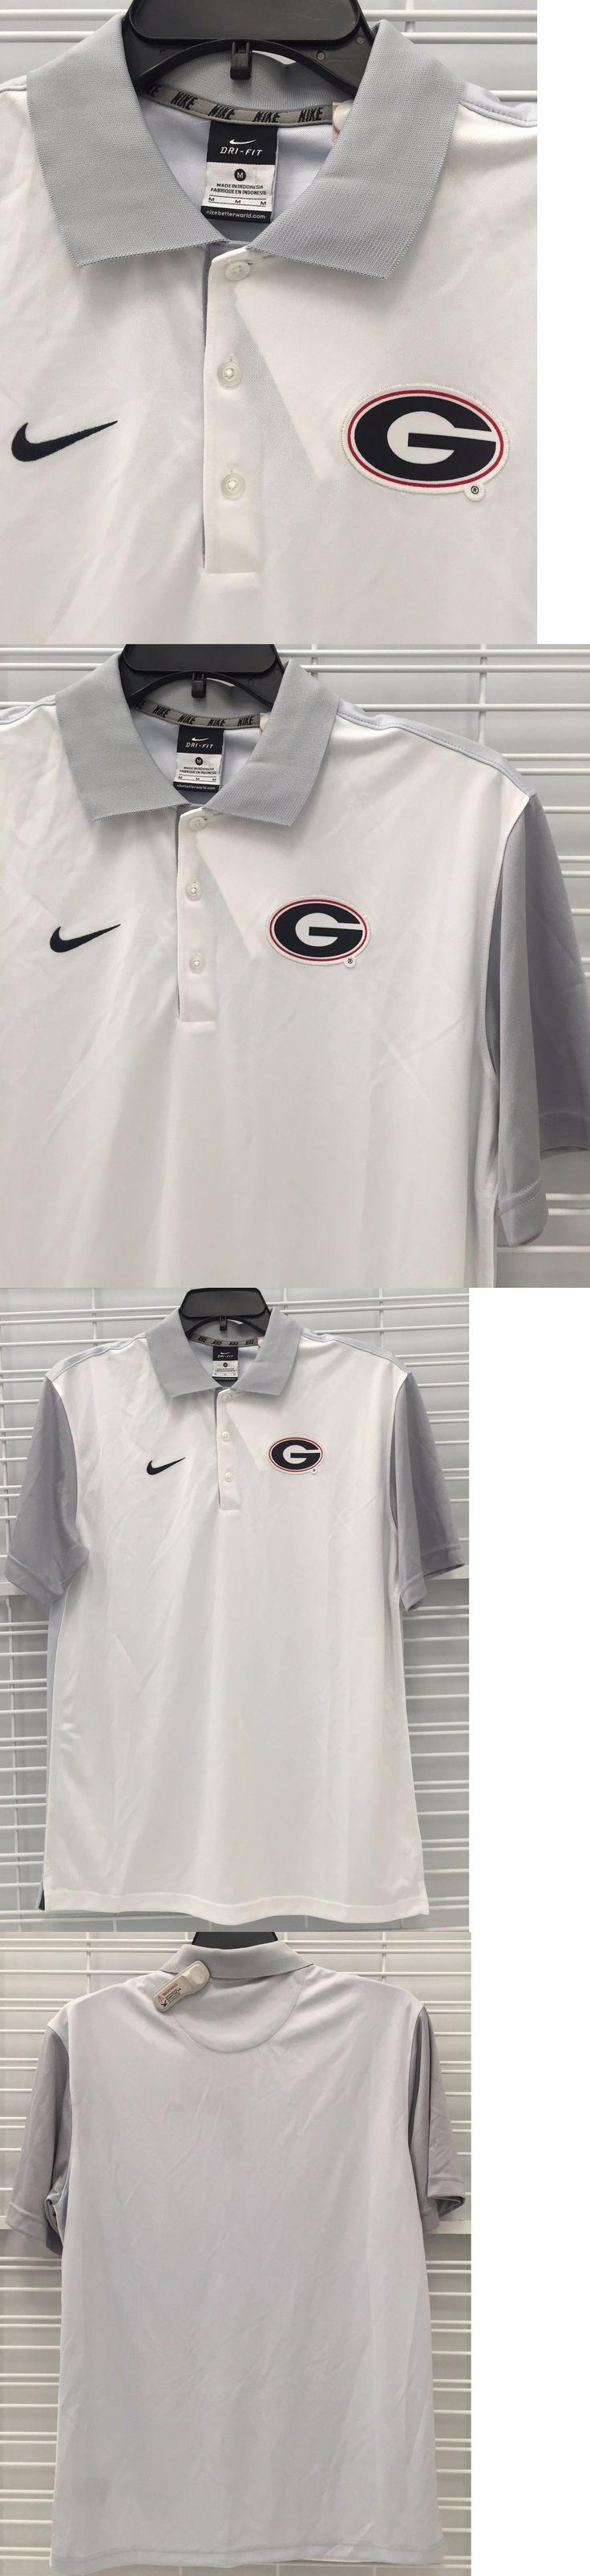 College-NCAA 24541: New Nike University Of Georgia Bulldogs Uga Men S Polo Dress Shirt White Stitch -> BUY IT NOW ONLY: $32.99 on eBay!